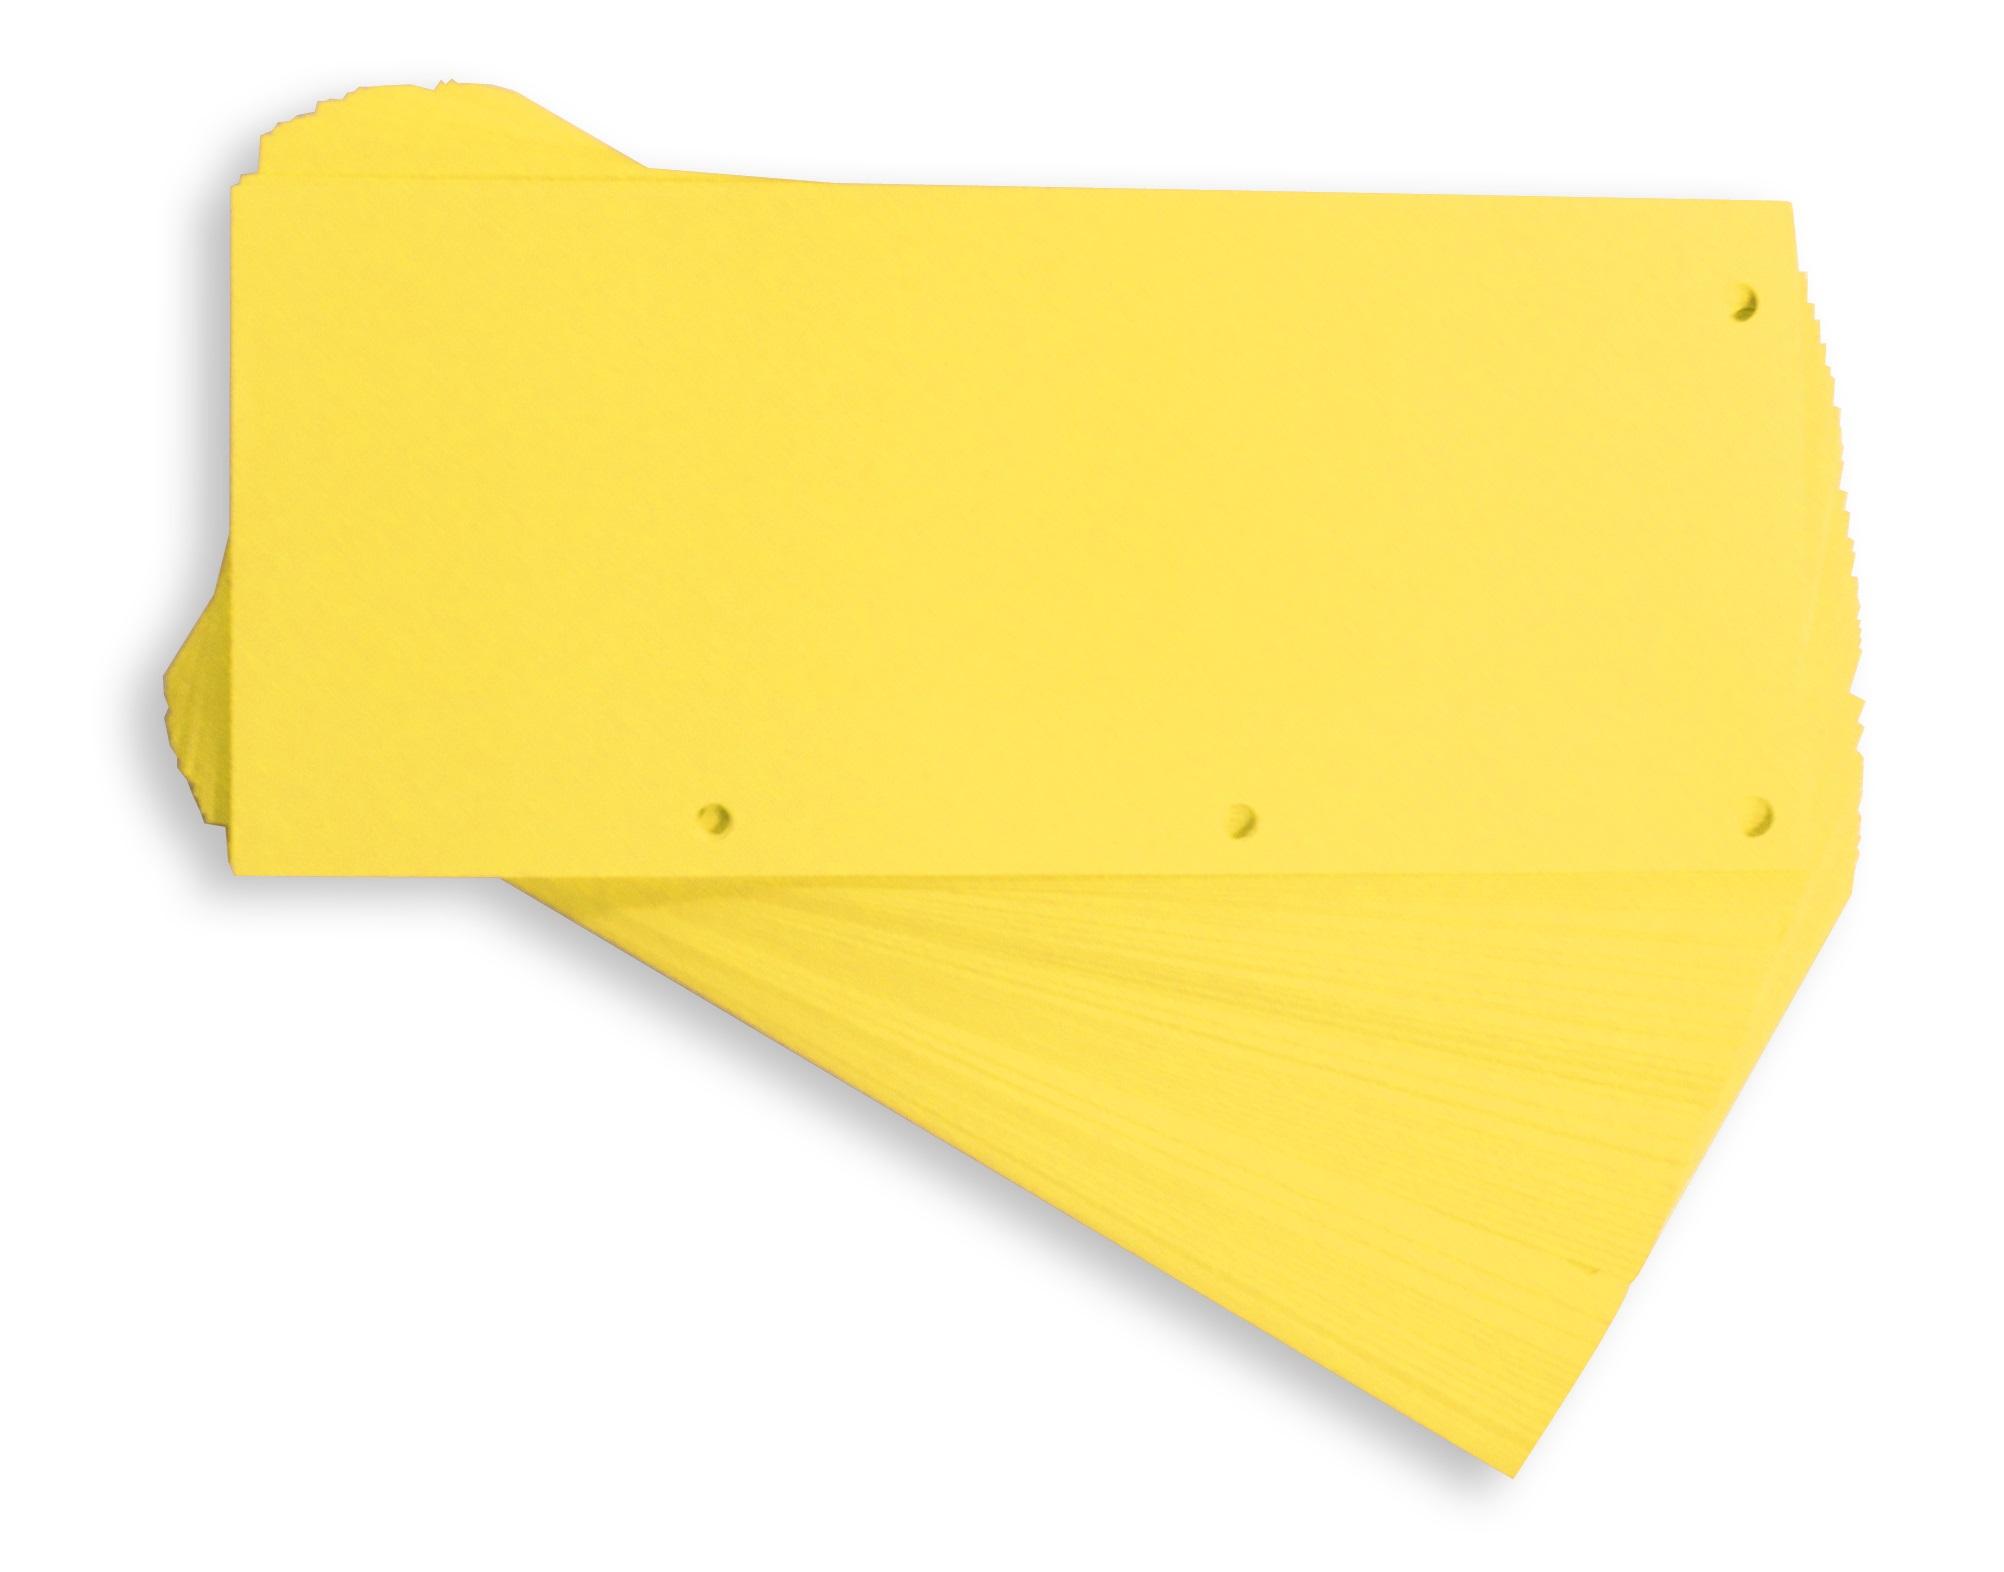 Separatoare carton pentru biblioraft, 190g/mp, 105 x 240 mm, 60/set, ELBA Duo - galben